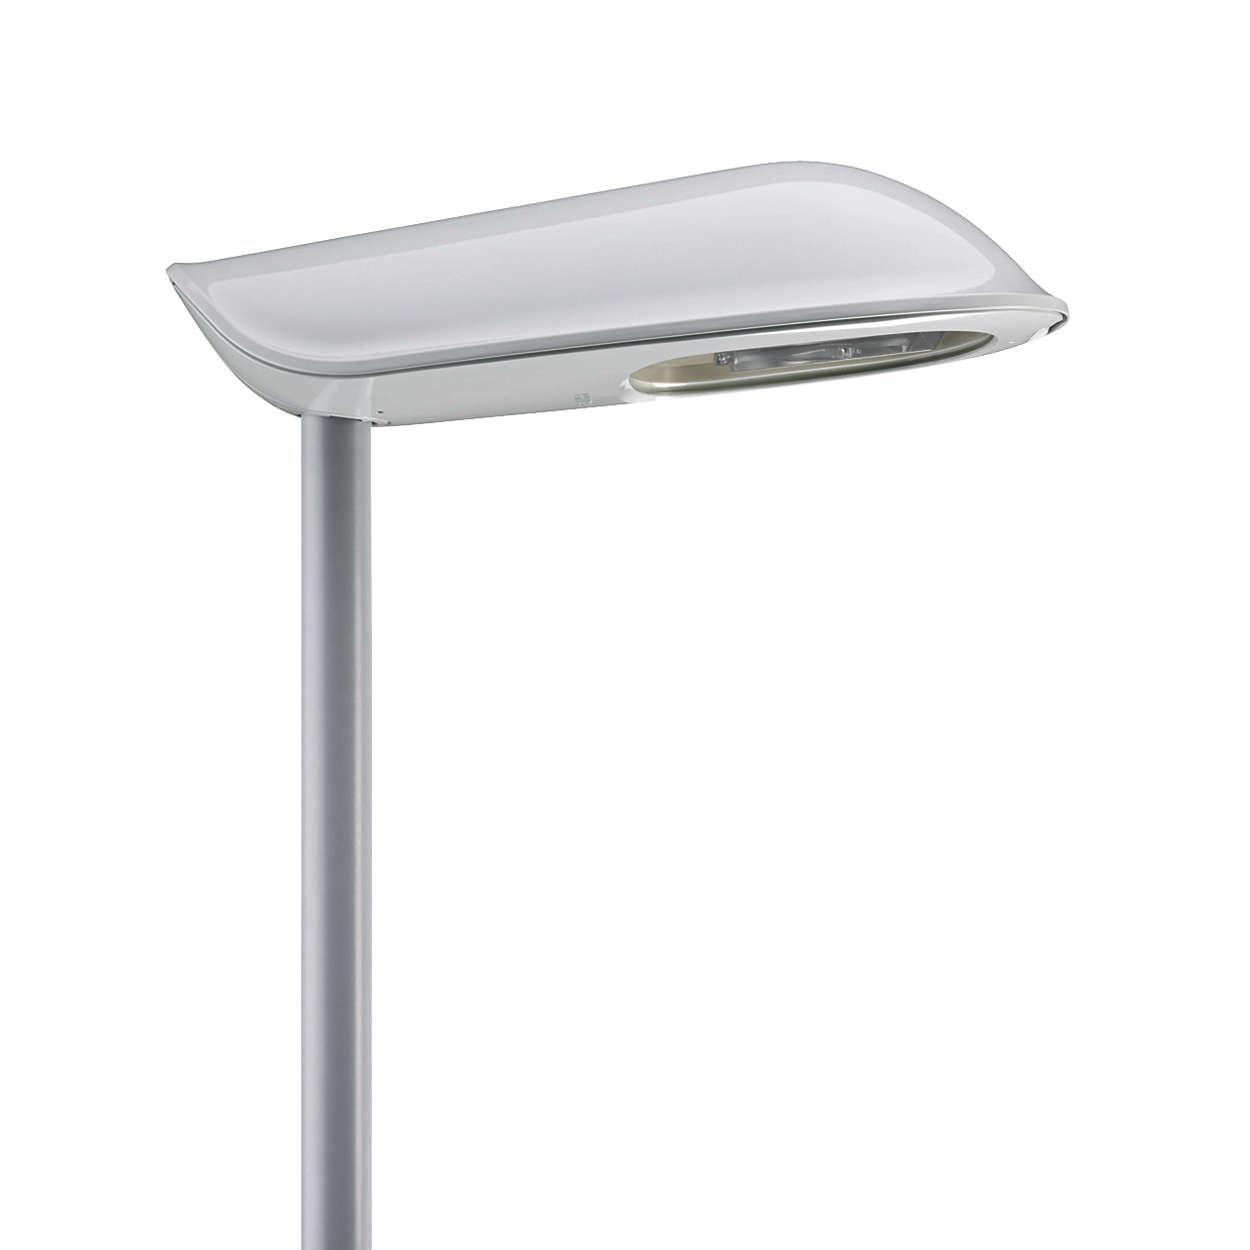 Iridium² – Future proof lighting performance